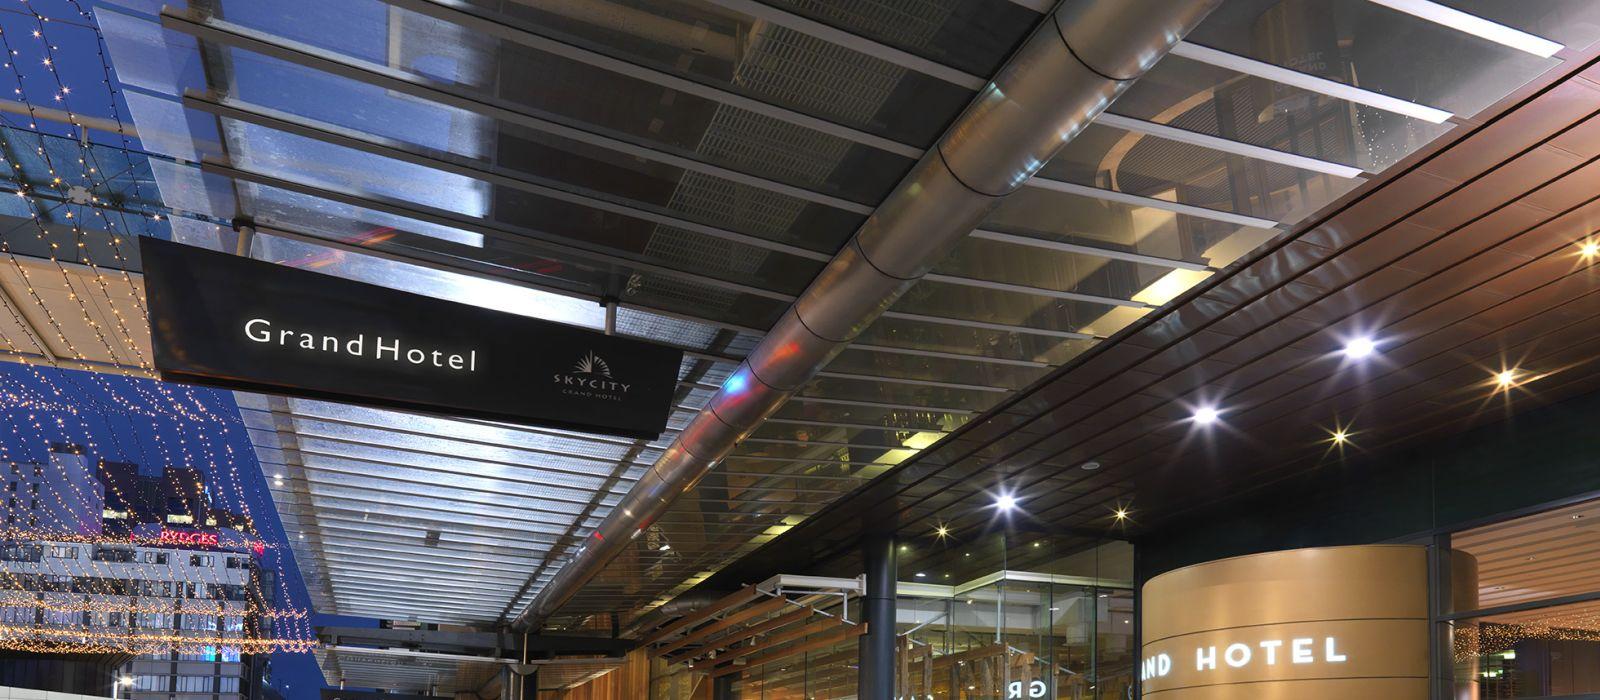 Hotel Sky City Grand  Neuseeland